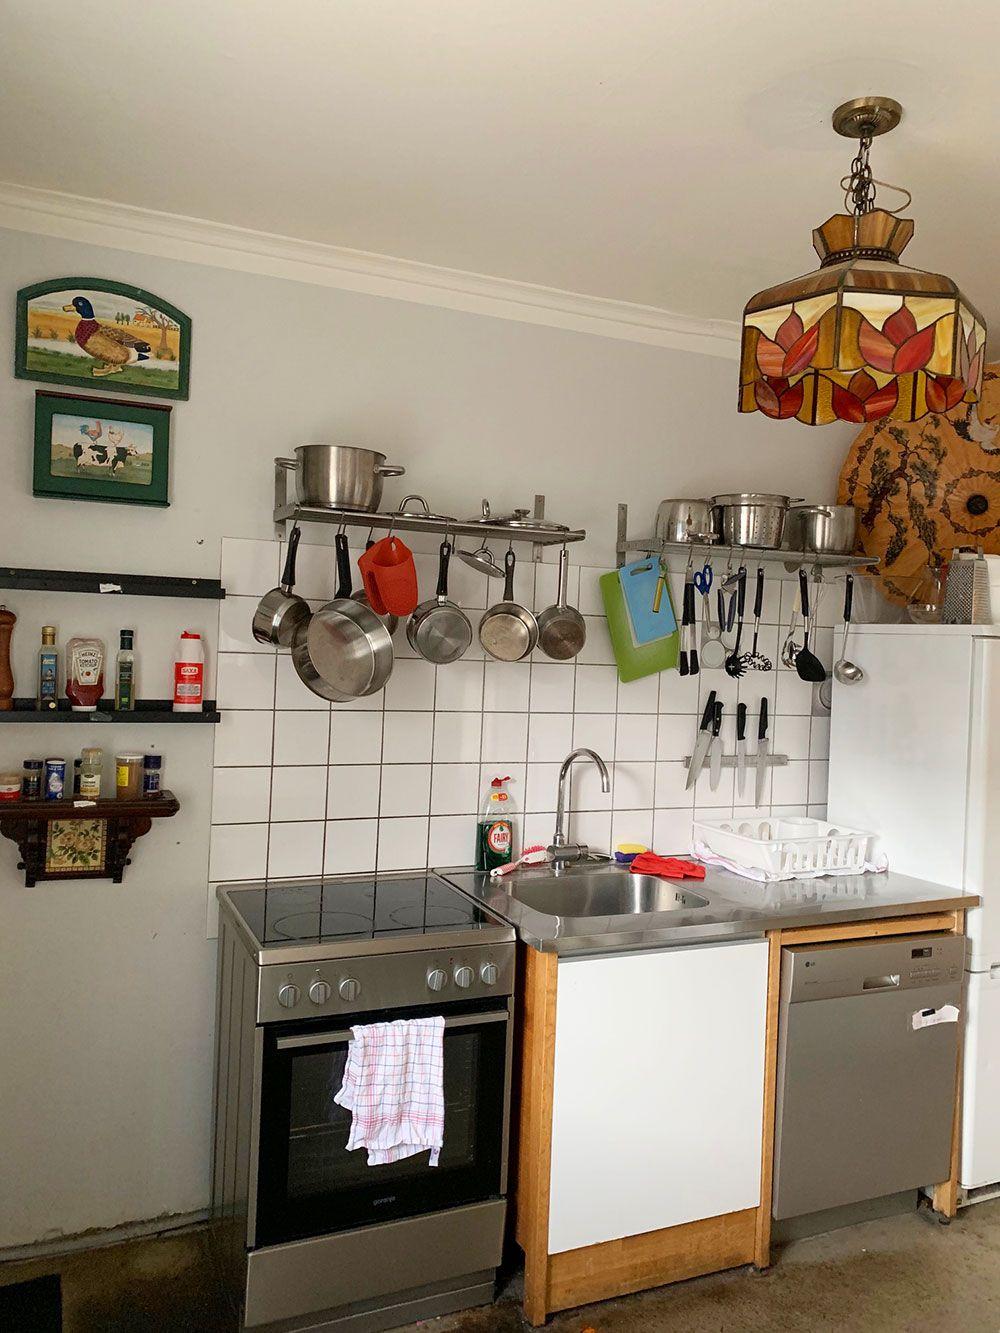 Alojamiento en Islandia - Loki Guesthouse - Cocina